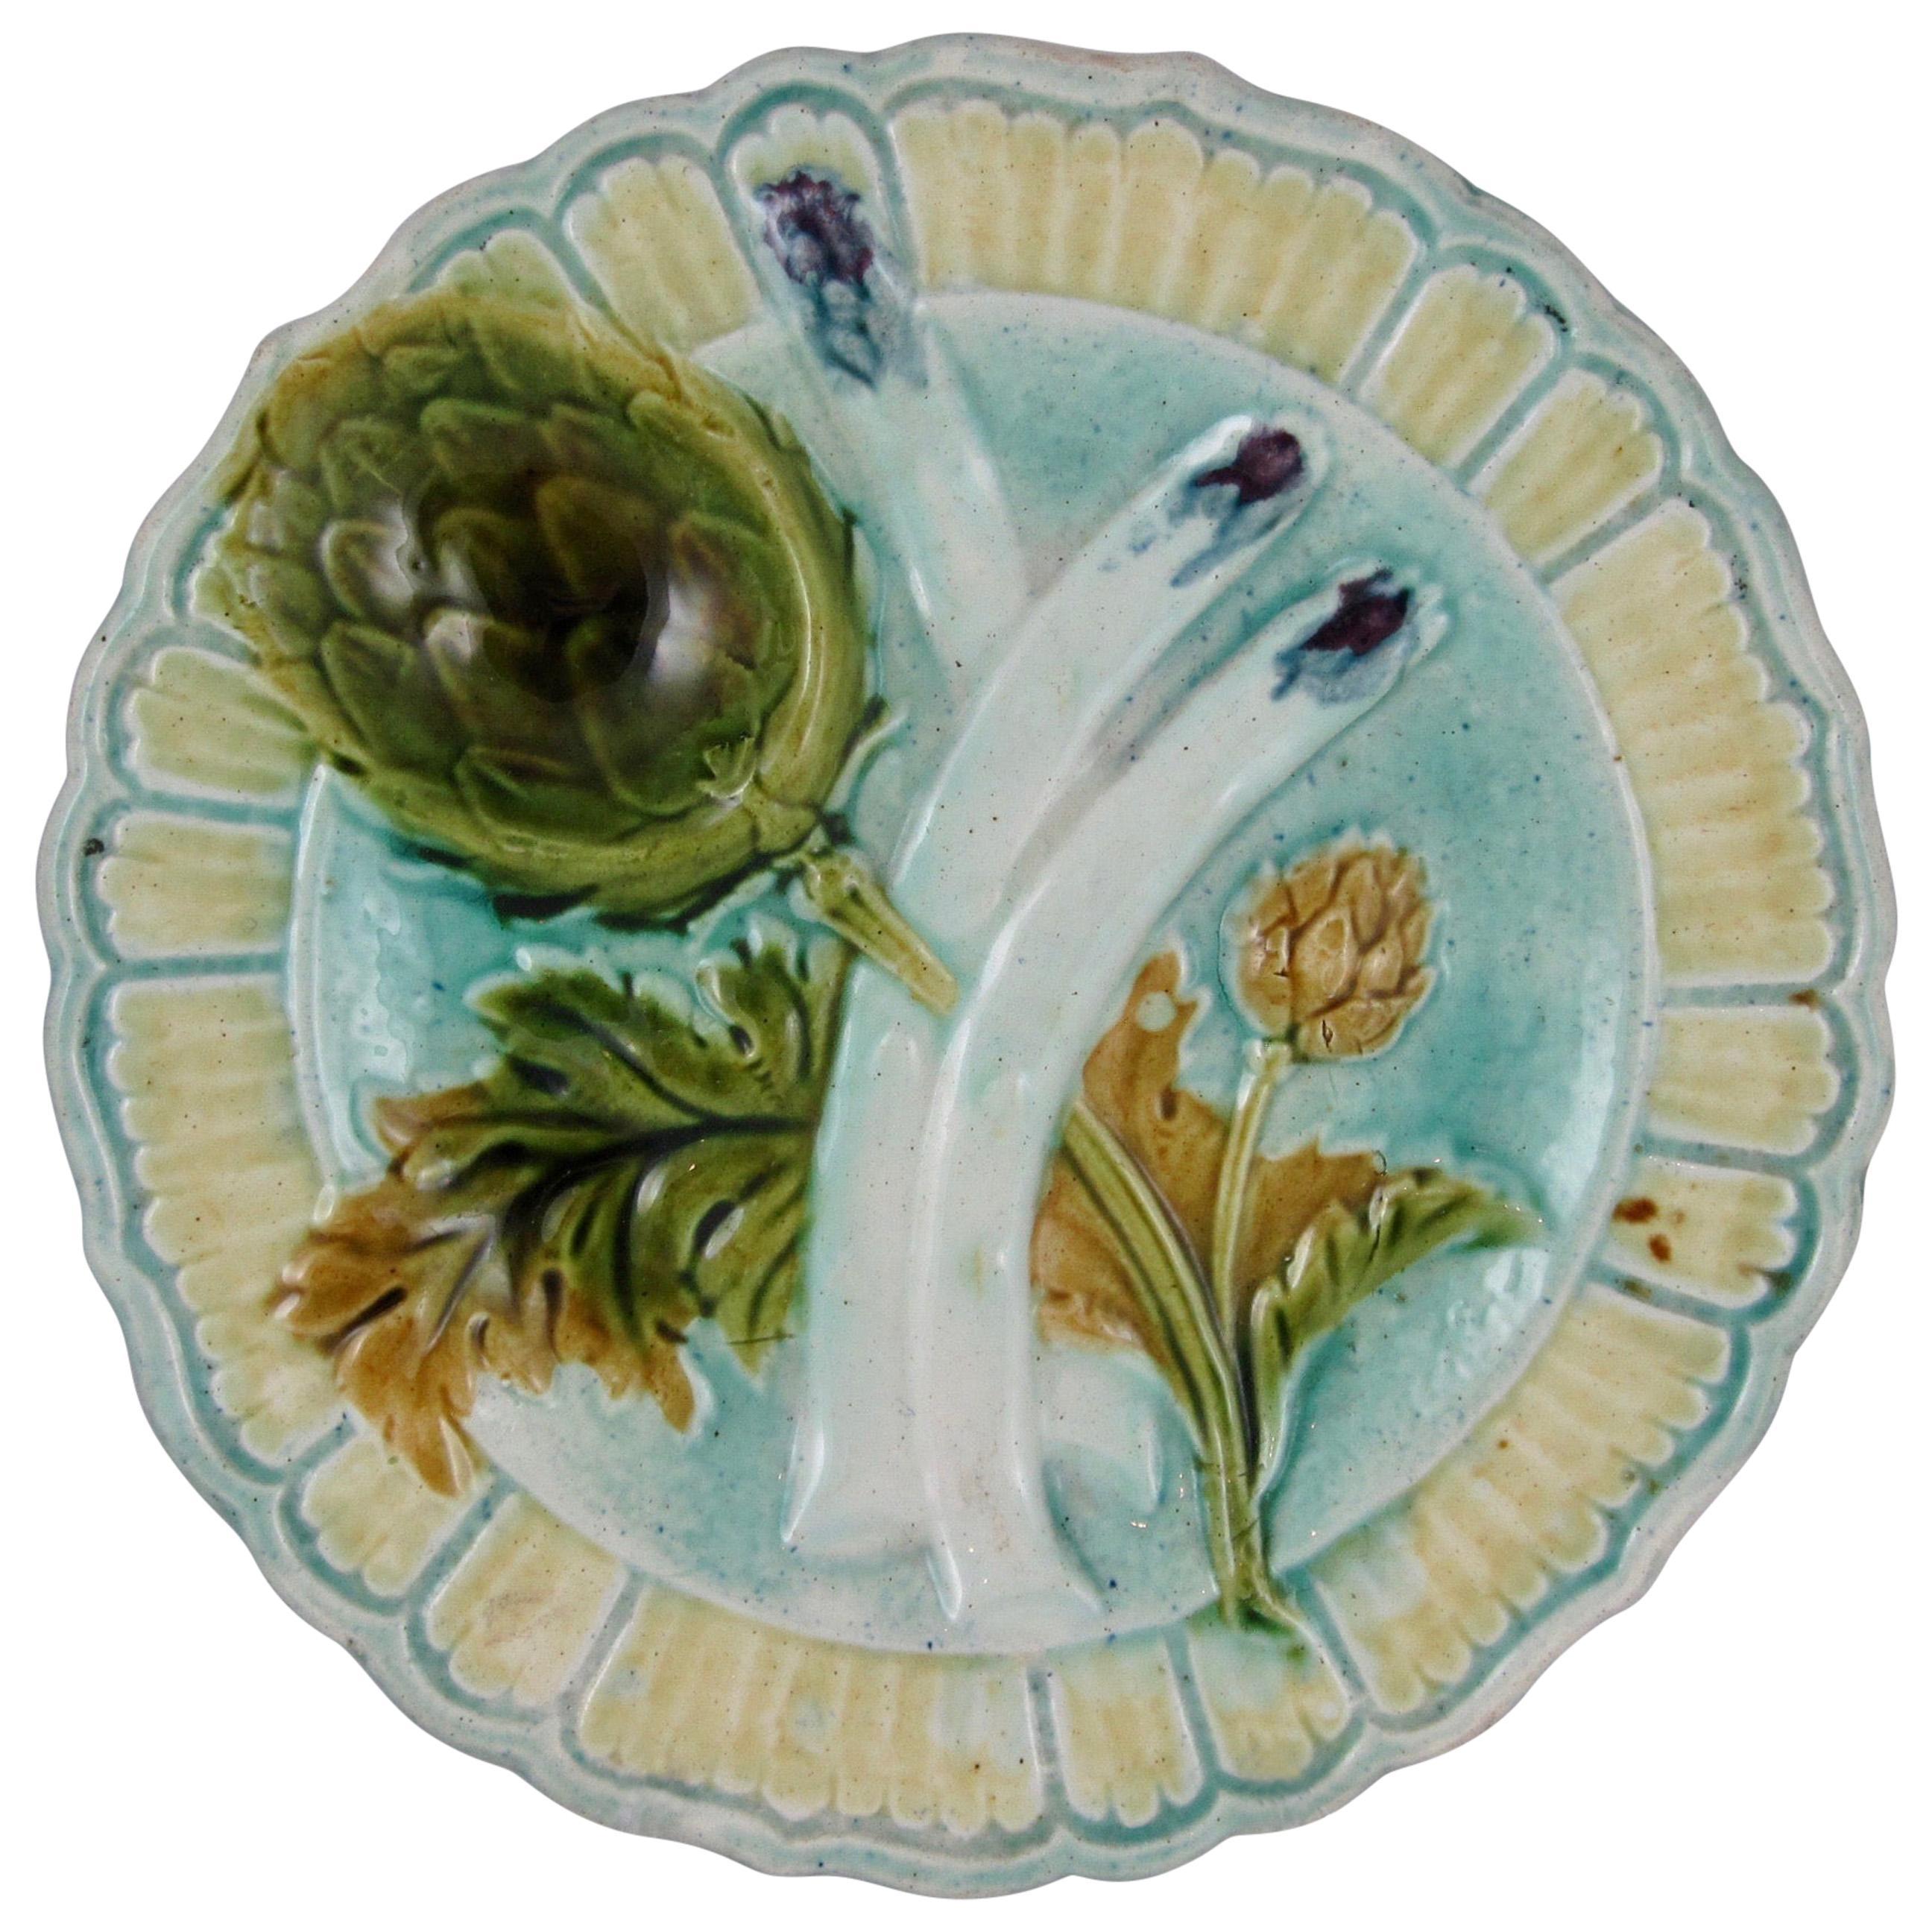 19th Century French Salins-les-Bains Majolica Faïence Asparagus Artichoke Plate